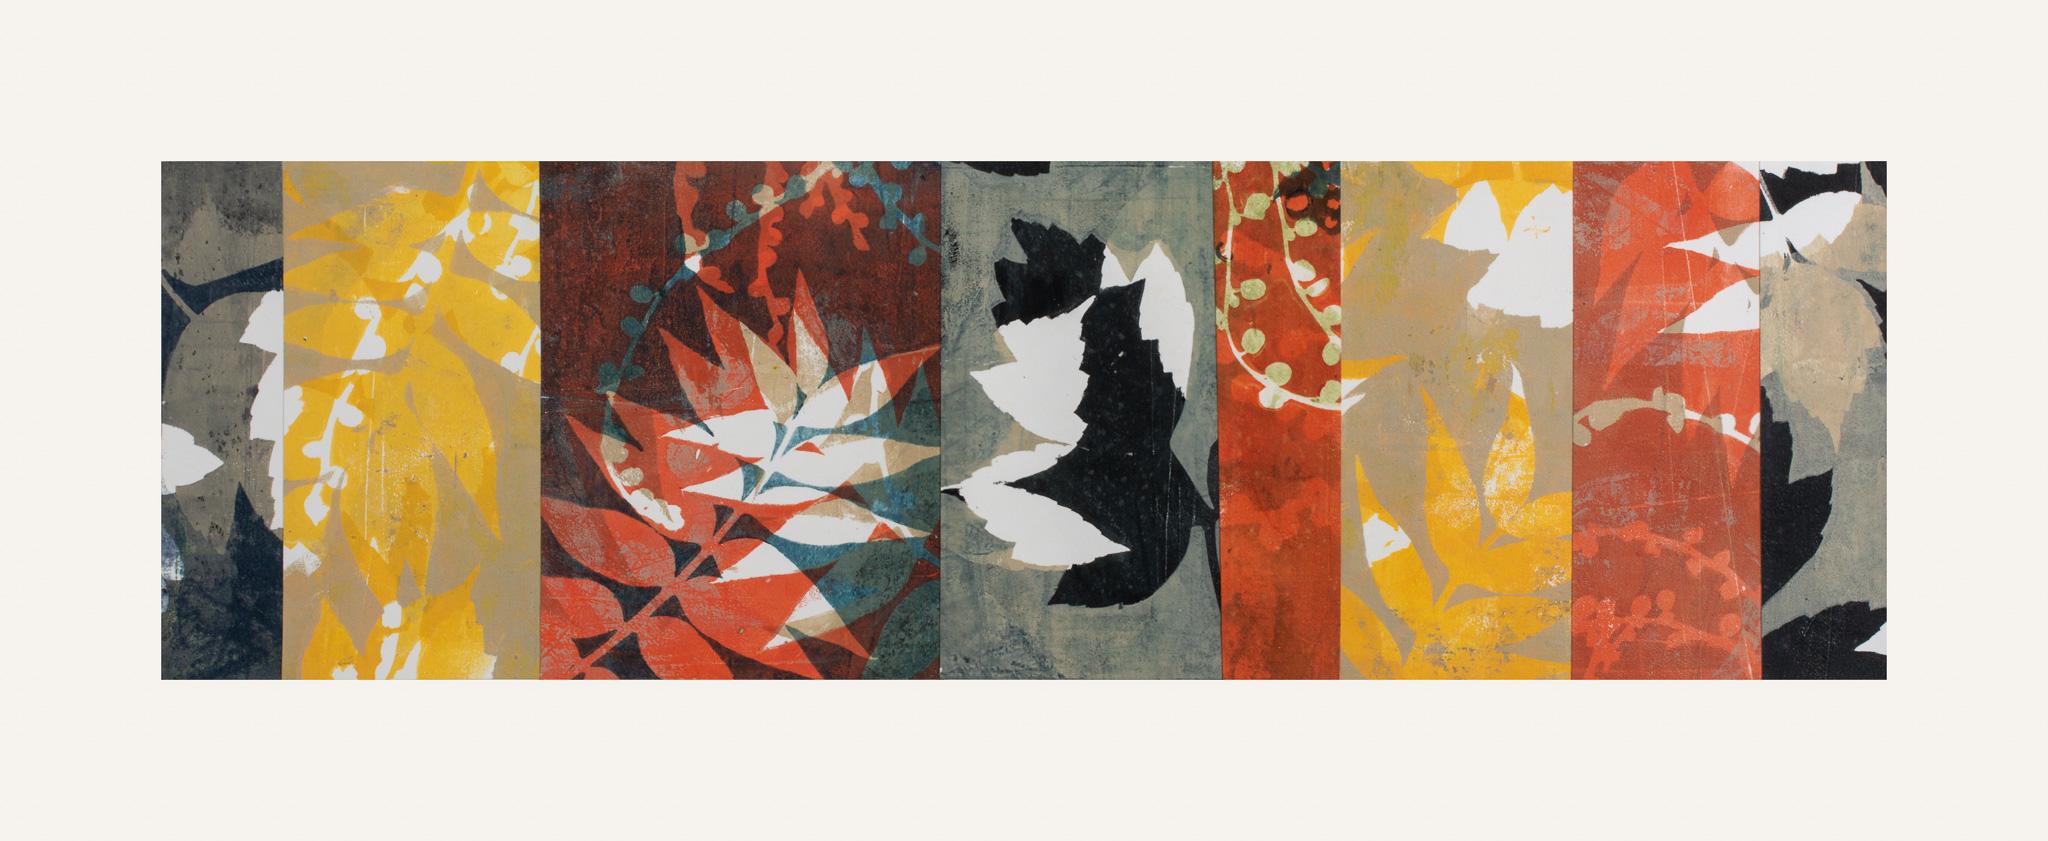 "Autumn Haze 2, 11"" x 30,"" Monoprint collage"